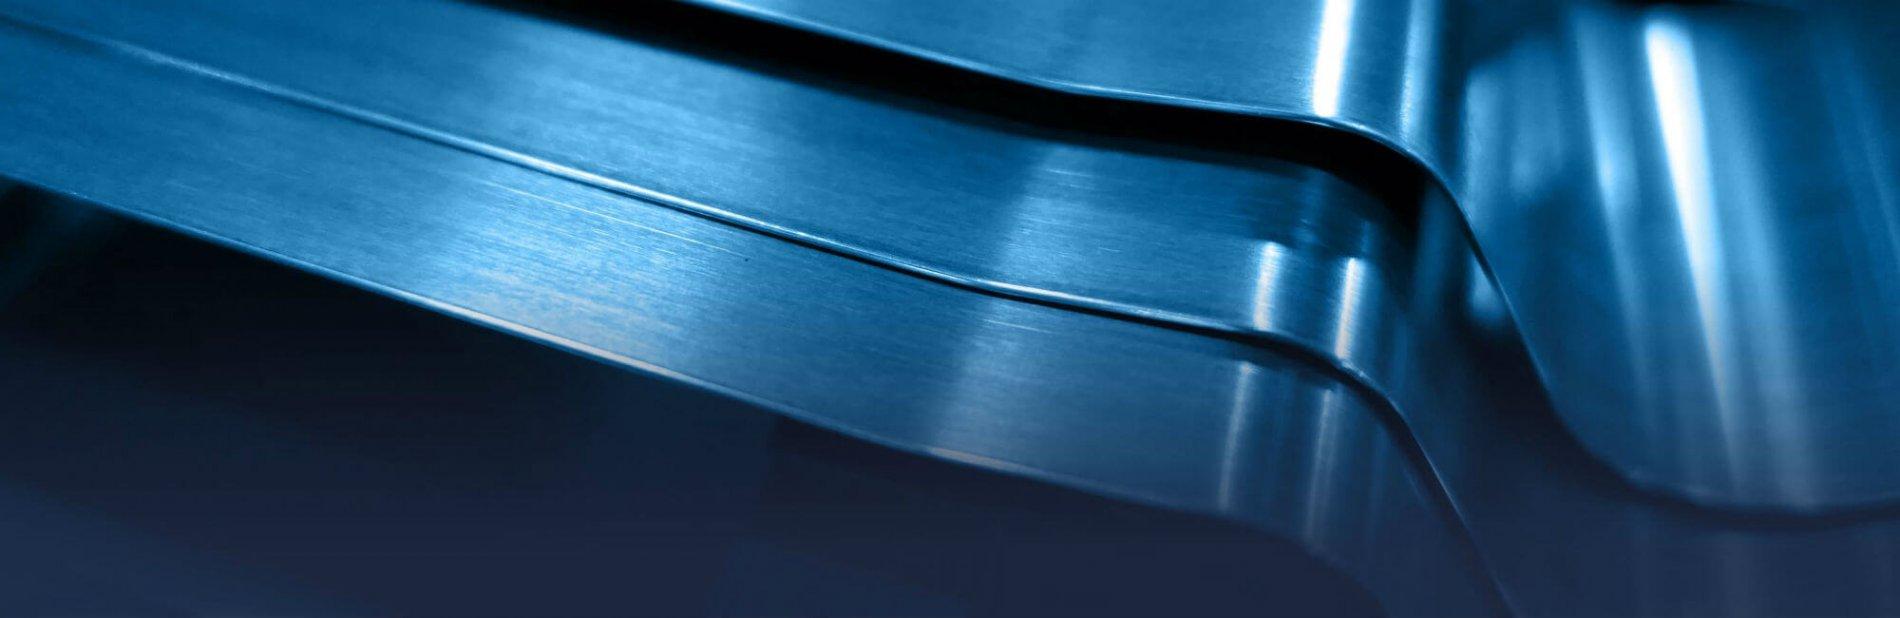 Blue Steel Spring